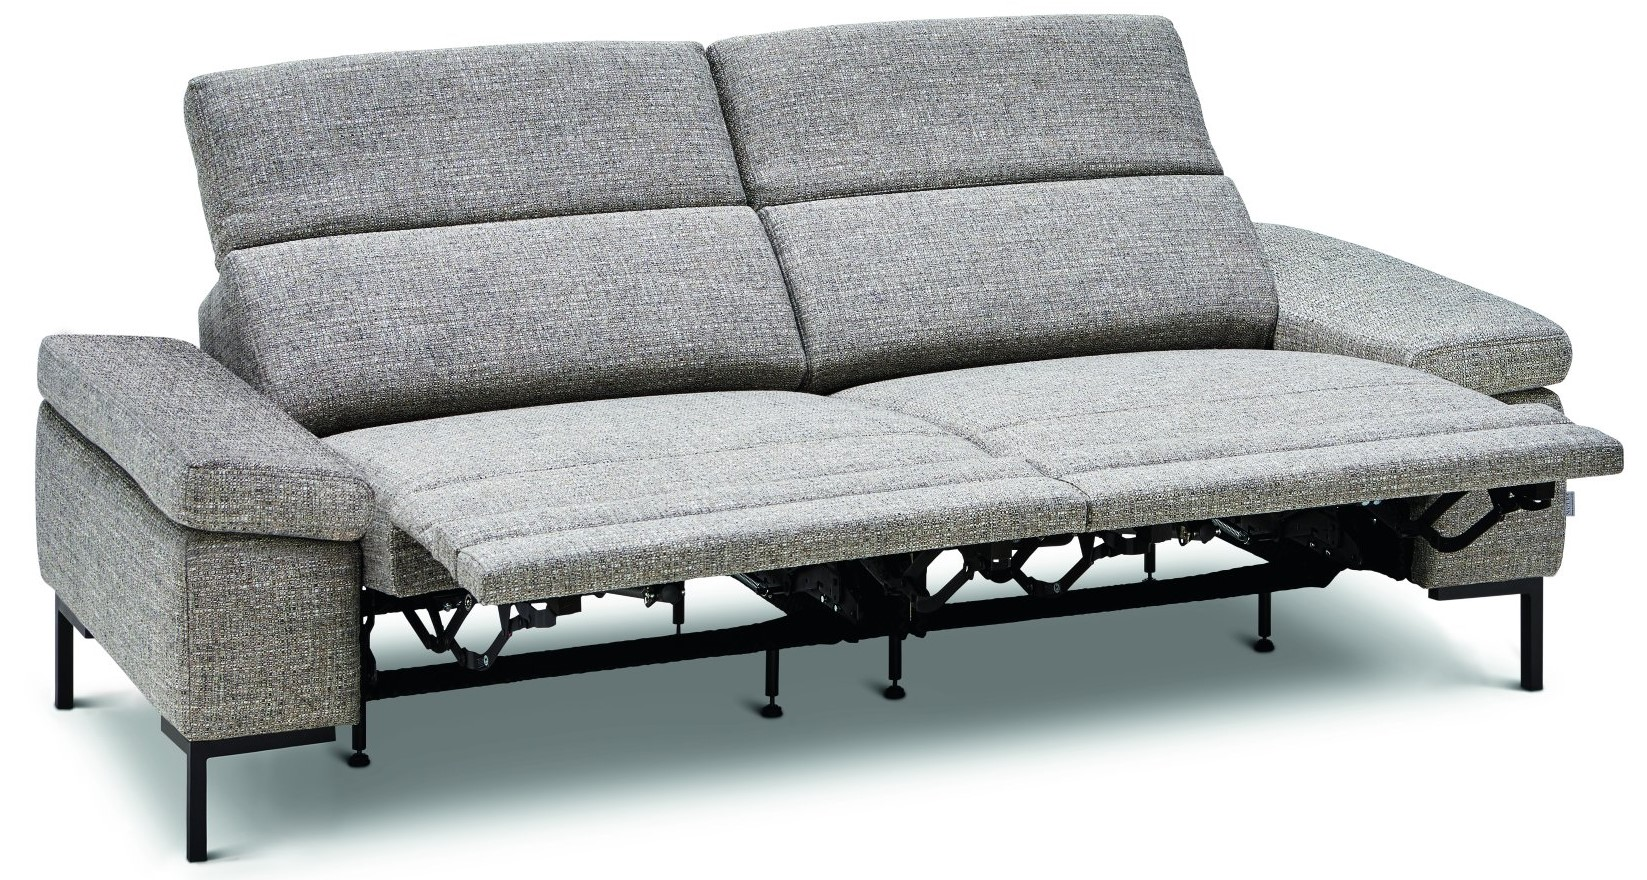 Sofa Hudson - 3-Sitzer, Relaxfunktion (motorisch), Kopfteil verstellbar (manuell), Stoff grau